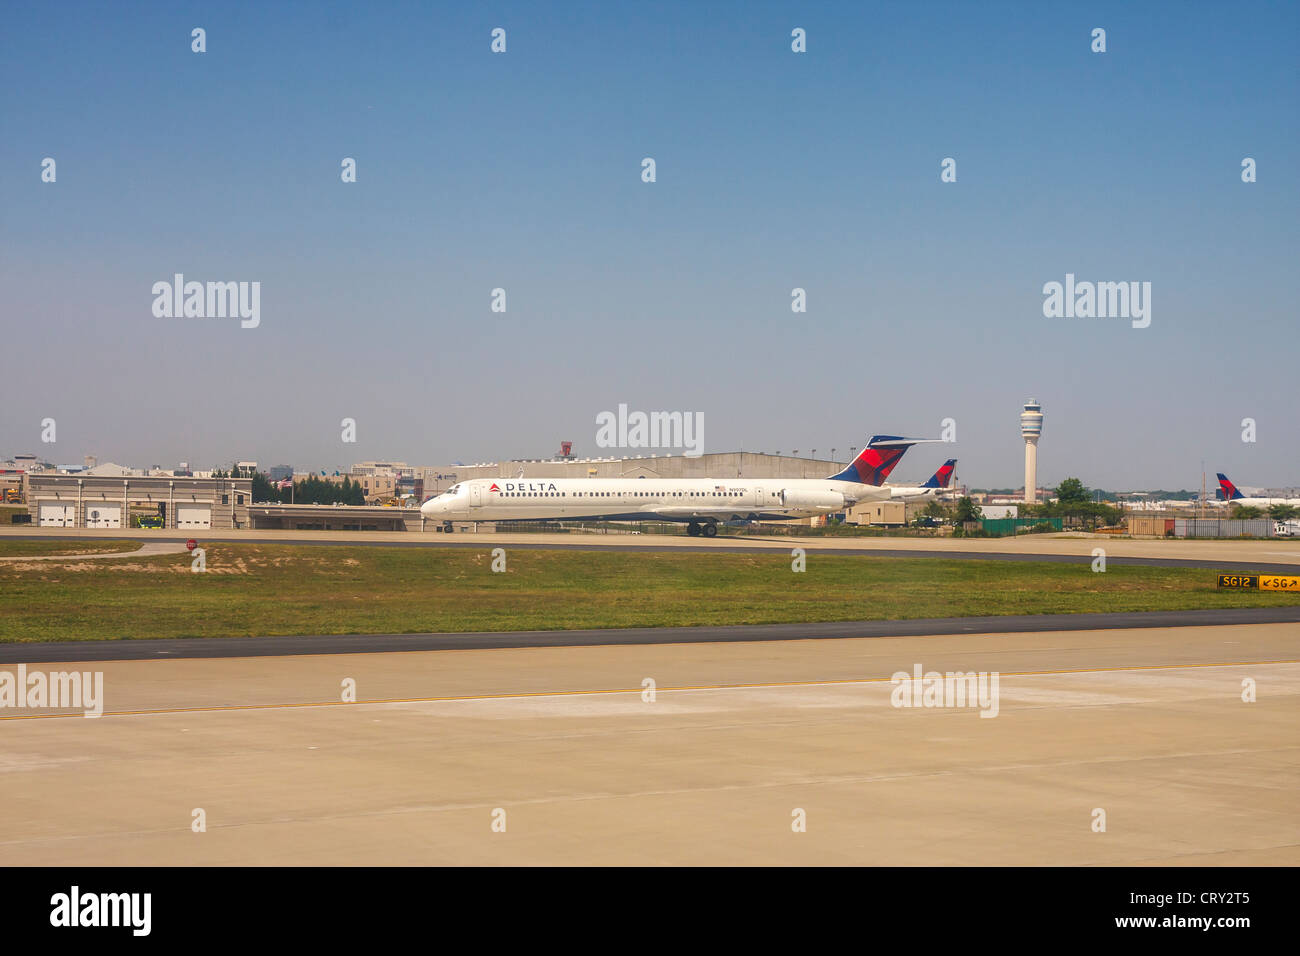 Delta airplane taxiing at Atlanta's Hartsfield Jackson Airport - Stock Image